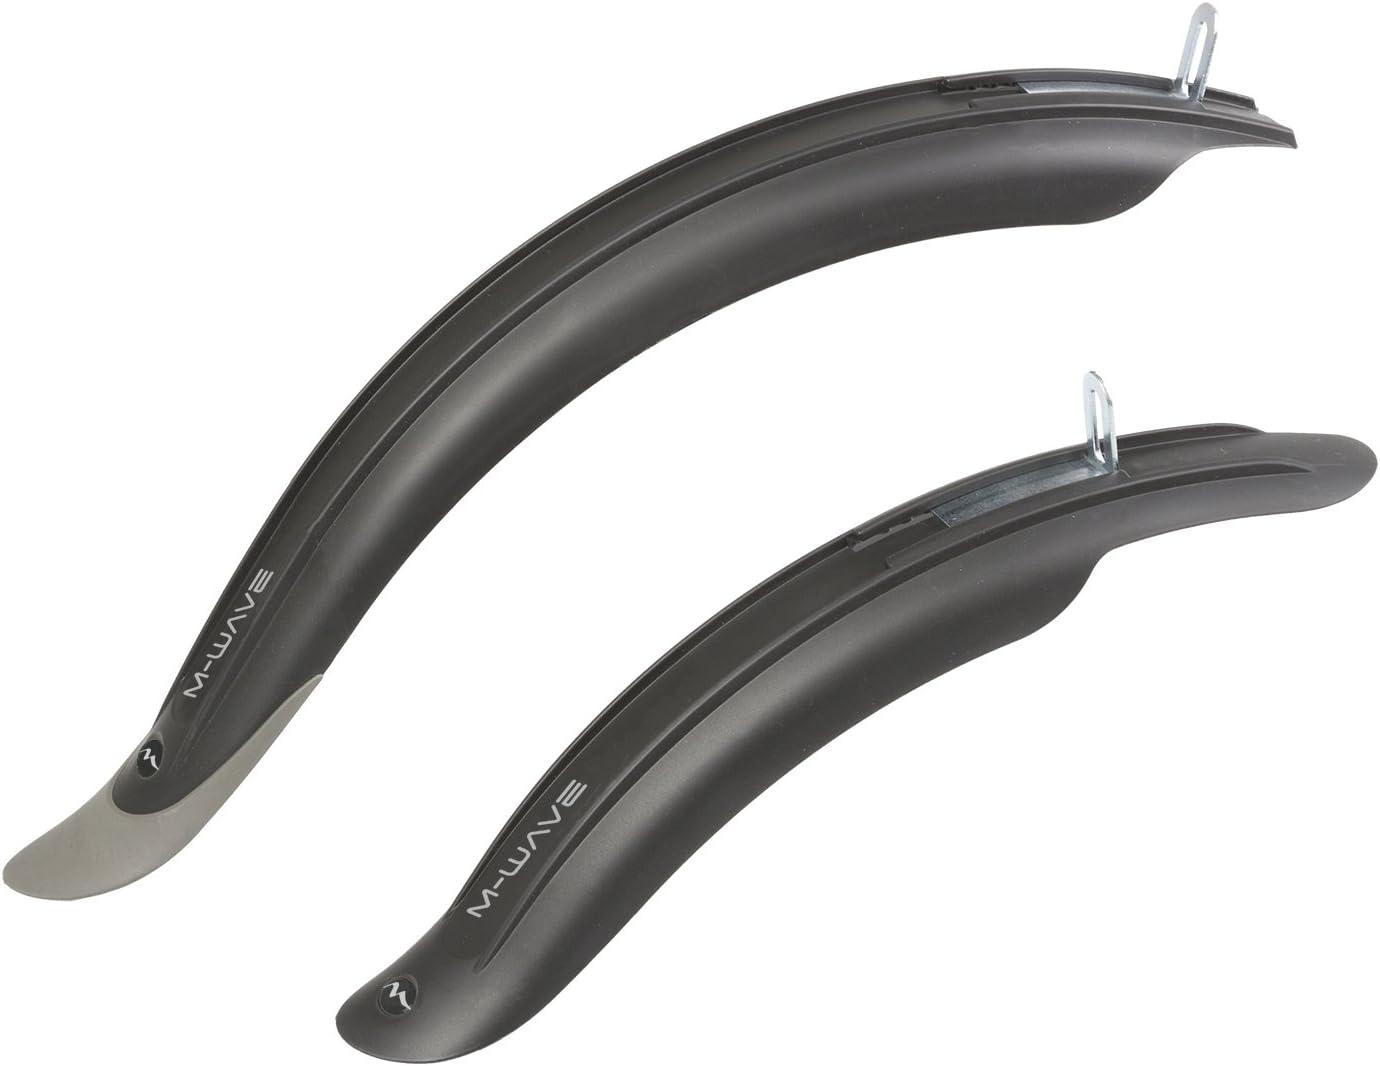 KIDS BIKE MUDGUARDS Black 12 To 20 Children Wheel Bicycle Front /& Rear Fender